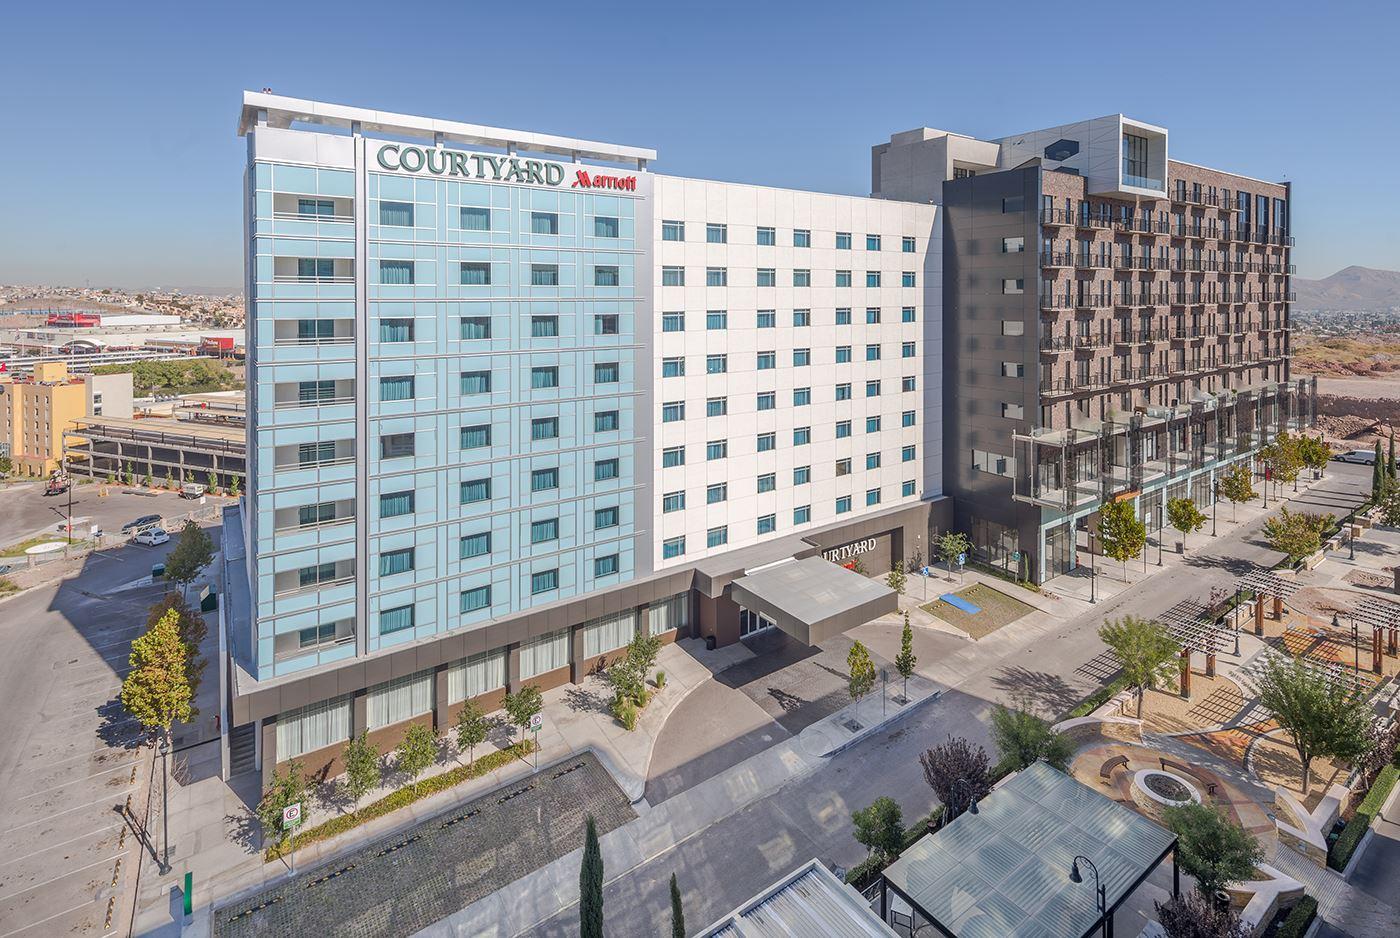 Courtyard Marriott® Chihuahua